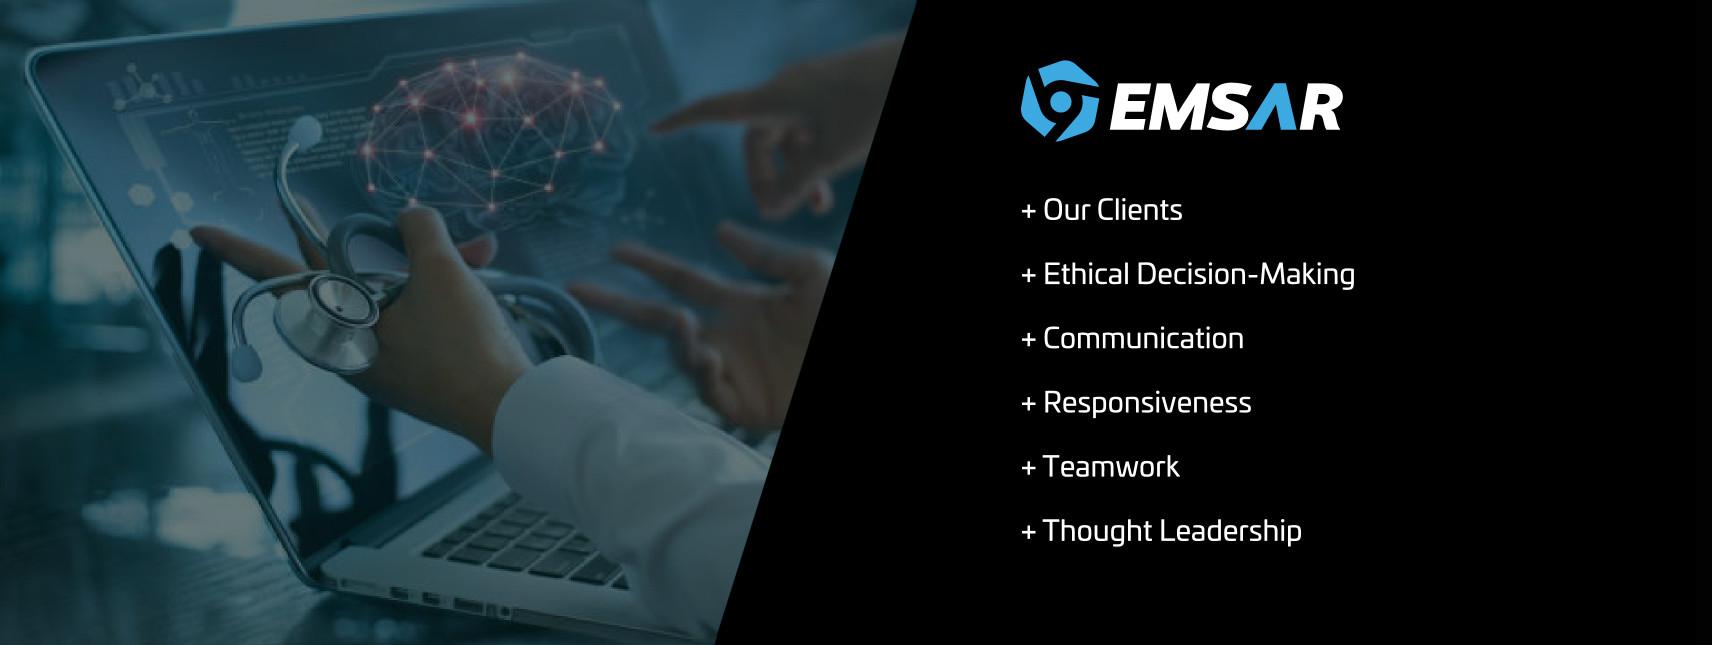 emsar services